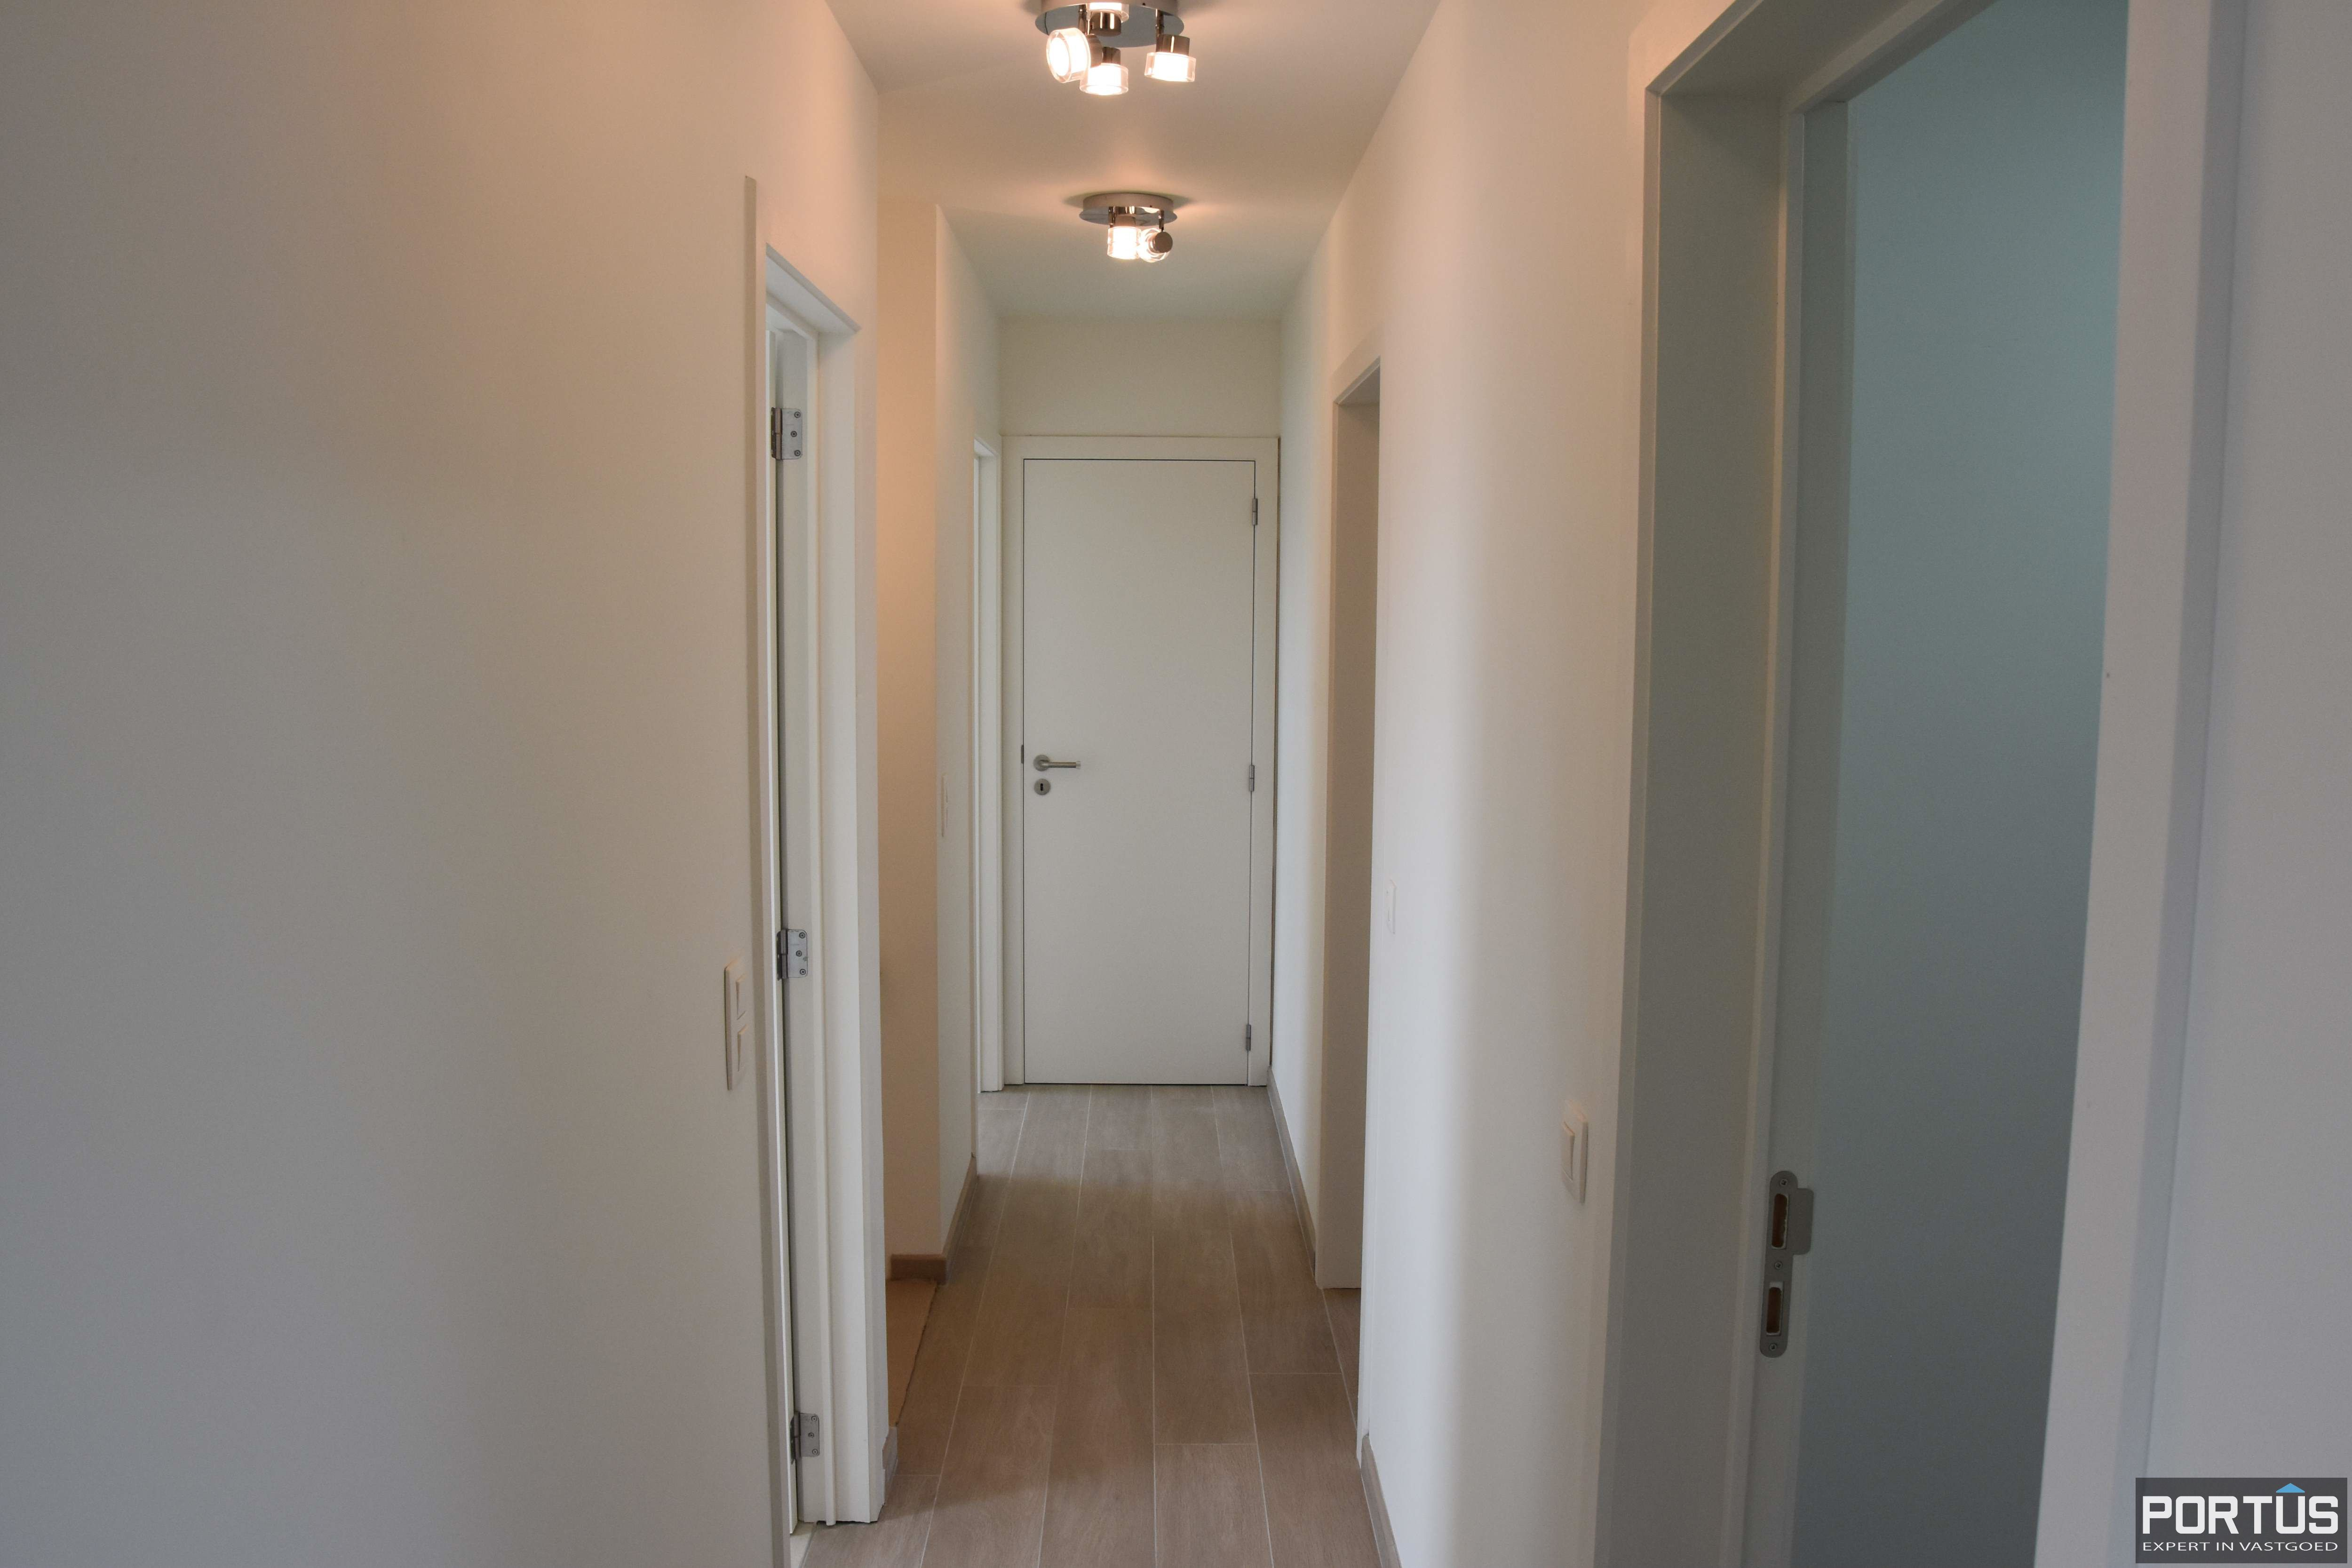 Recente villa te huur met 4 slaapkamers te Westende - 11240